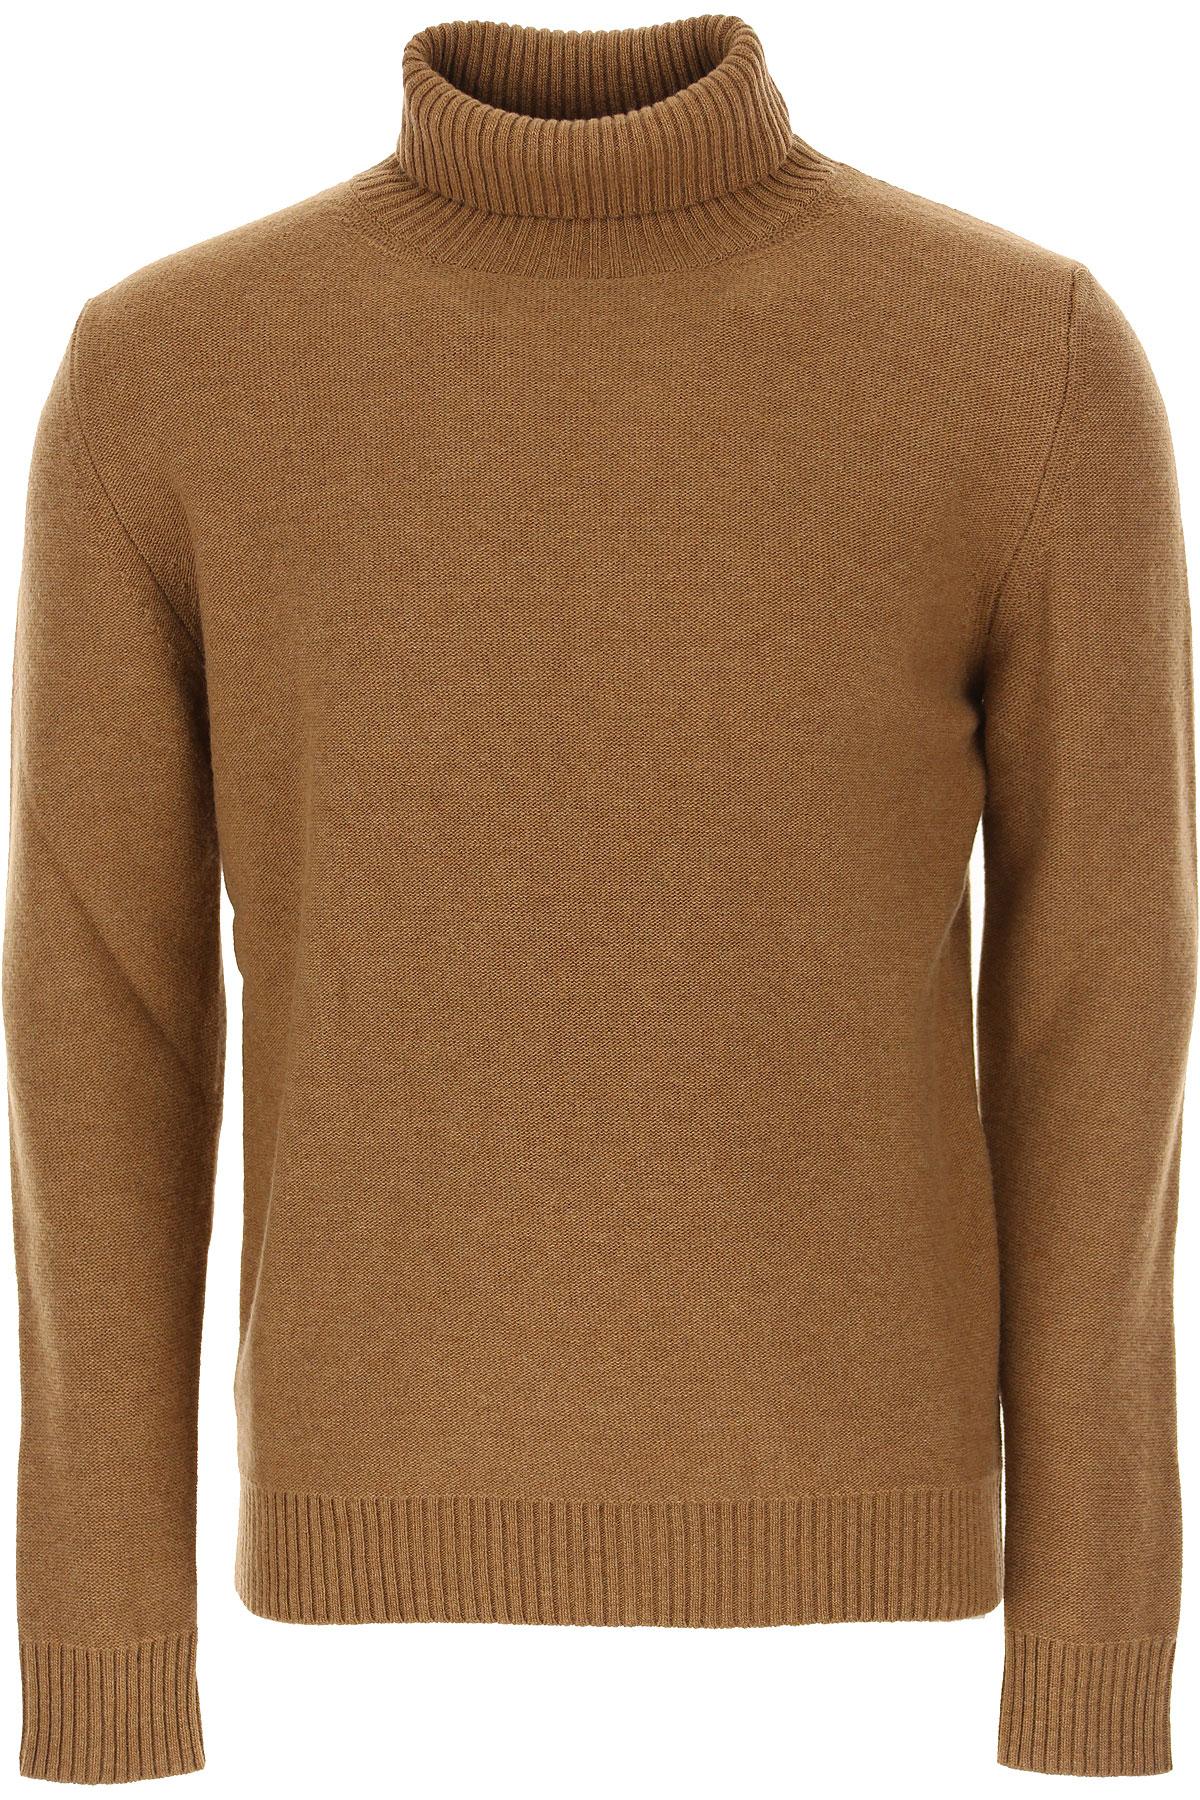 The Gigi Sweater for Men Jumper On Sale, Brown, Wool, 2019, L M XL